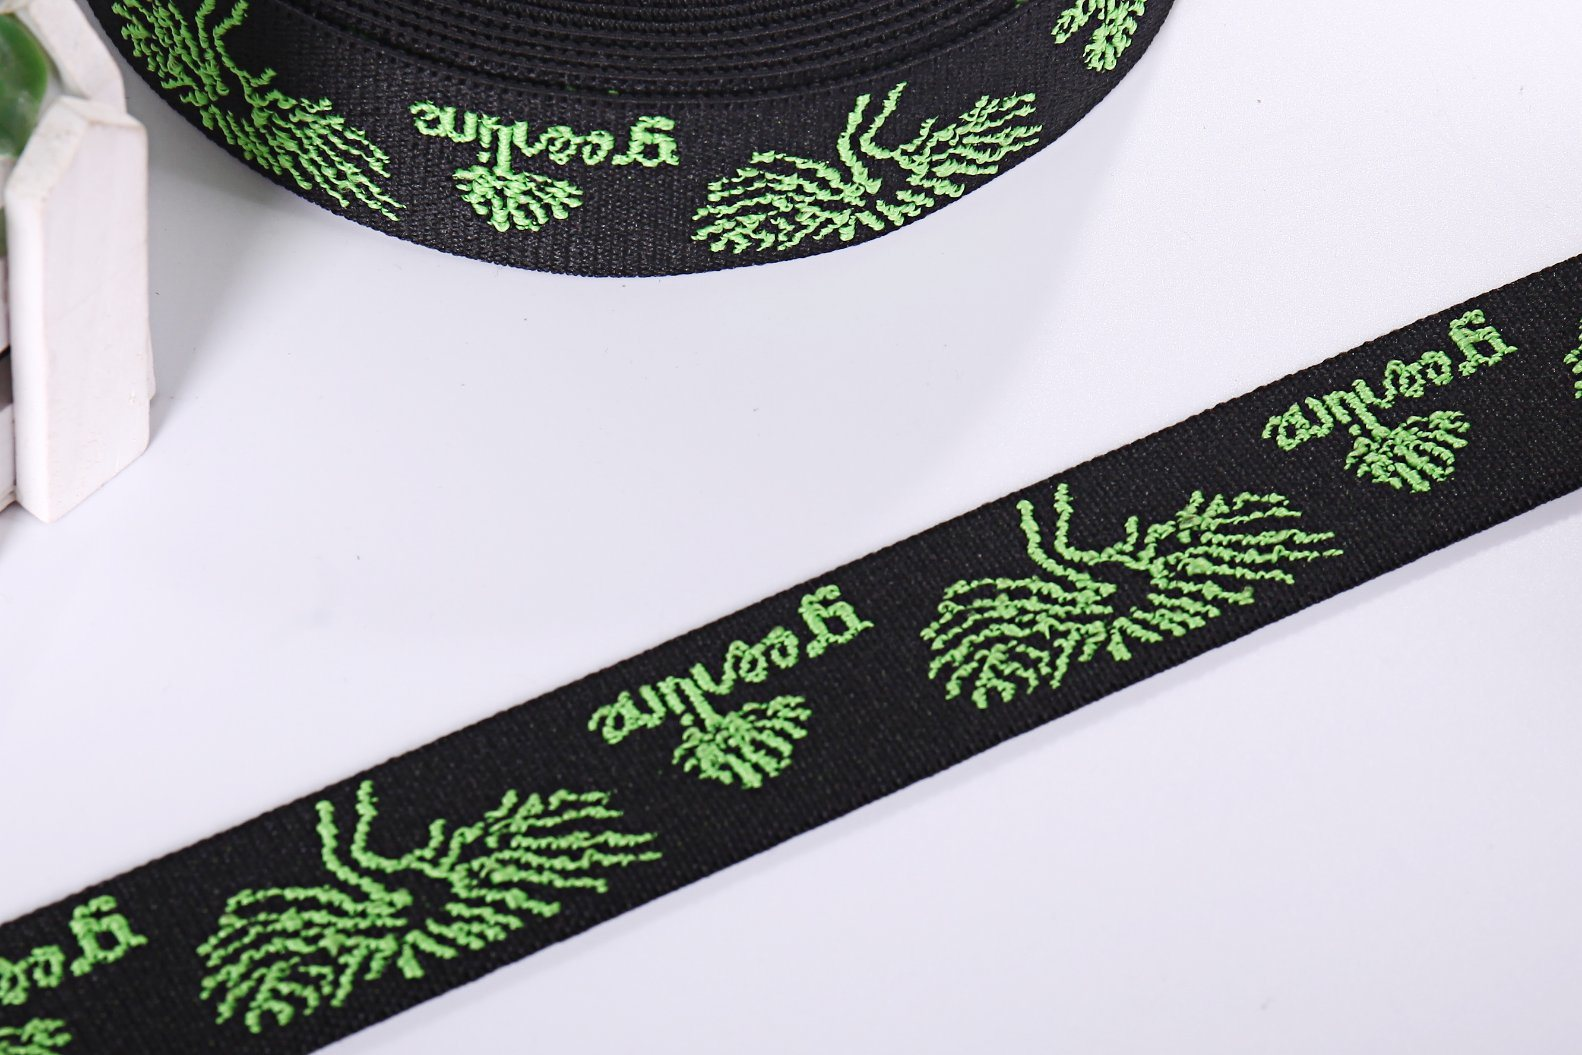 Nylon Customize Knitting Elastic Band Jacquard Webbing for Handbag